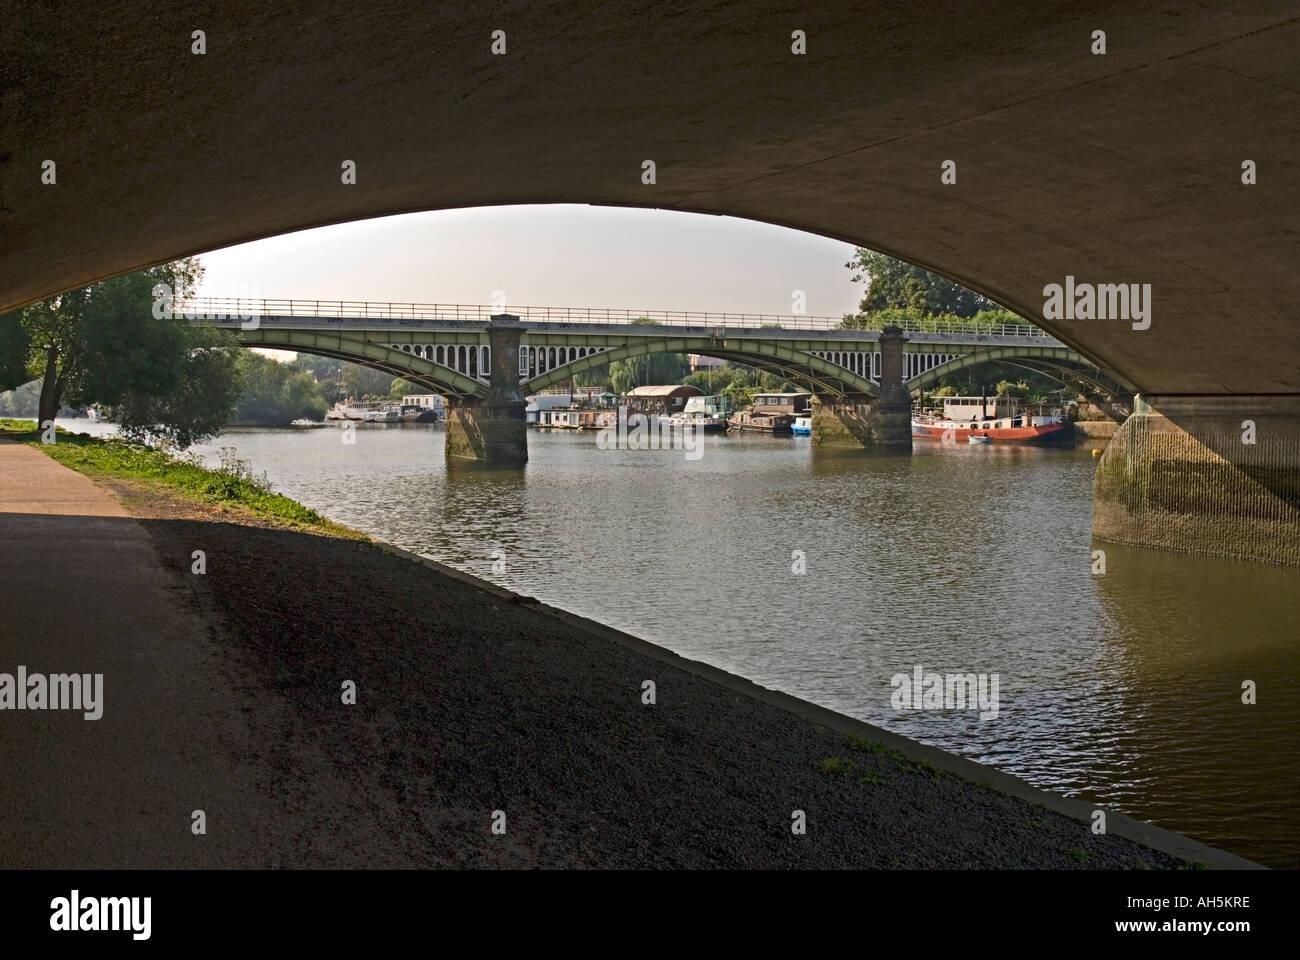 Richmond railway bridge on the River Thames London viewed from Twickenham bridge - Stock Image